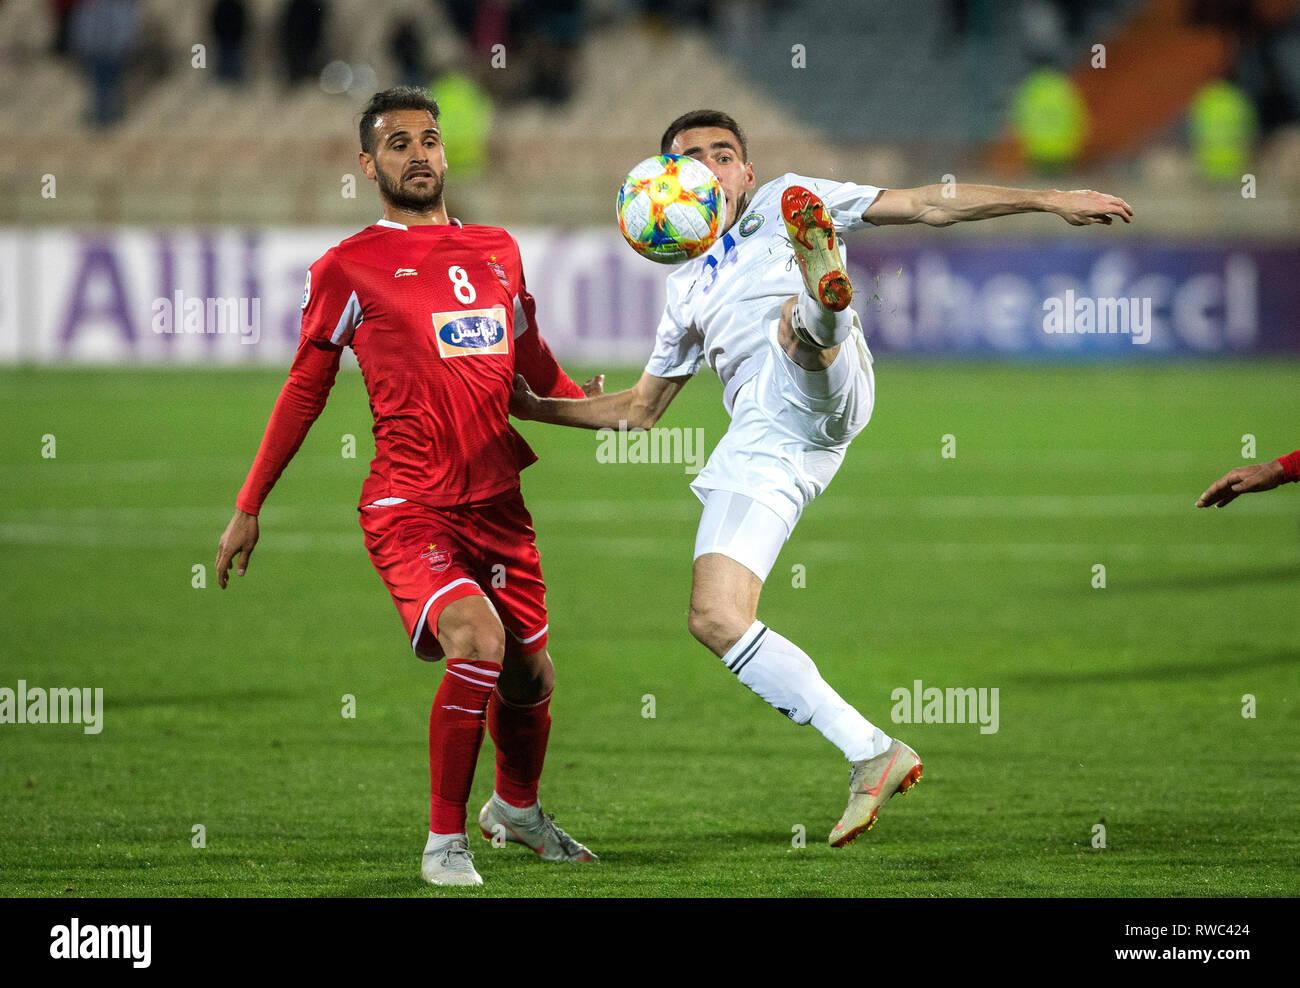 Tehran Iran 5th Mar 2019 Ahmad Noorollahi L Of Persepolis Vies With Farrukh Sayfiev Of Pakhtakor